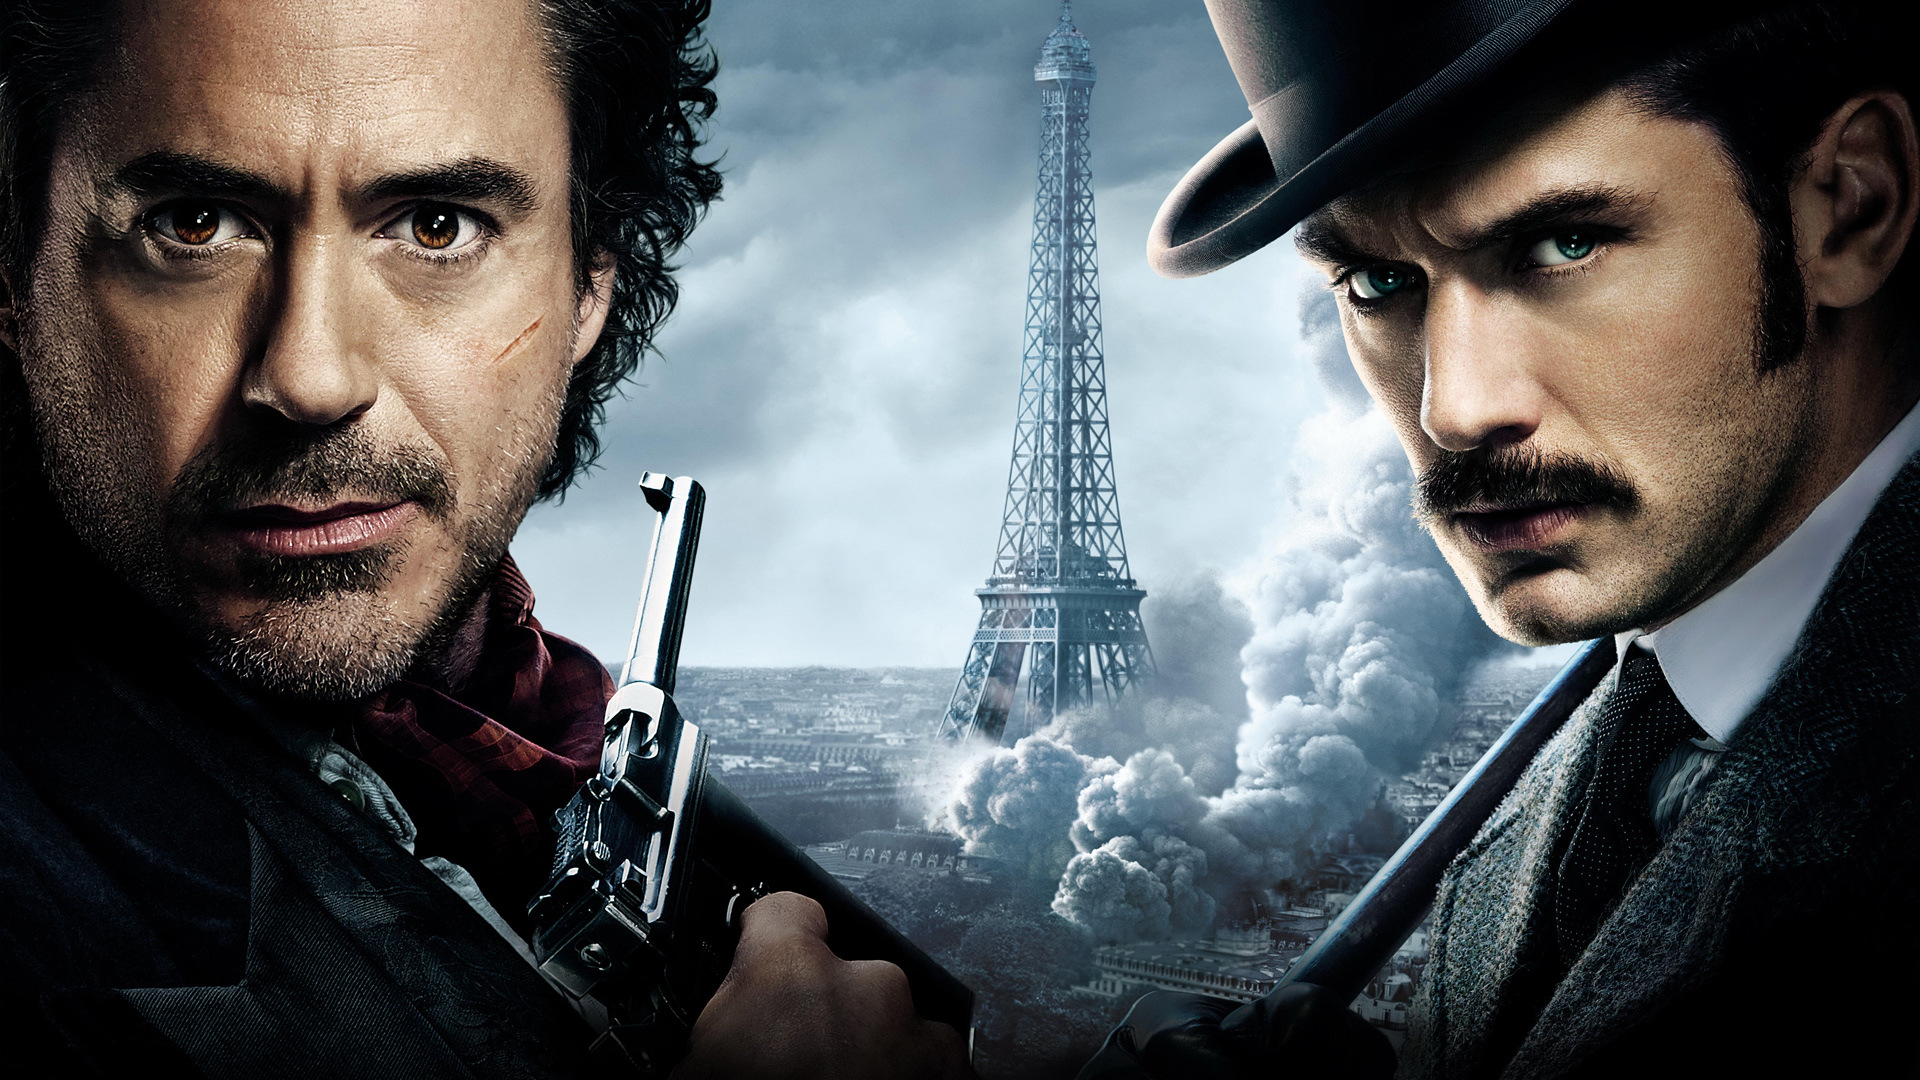 Sherlock Holmes a Game of Shadows wallpaper 1